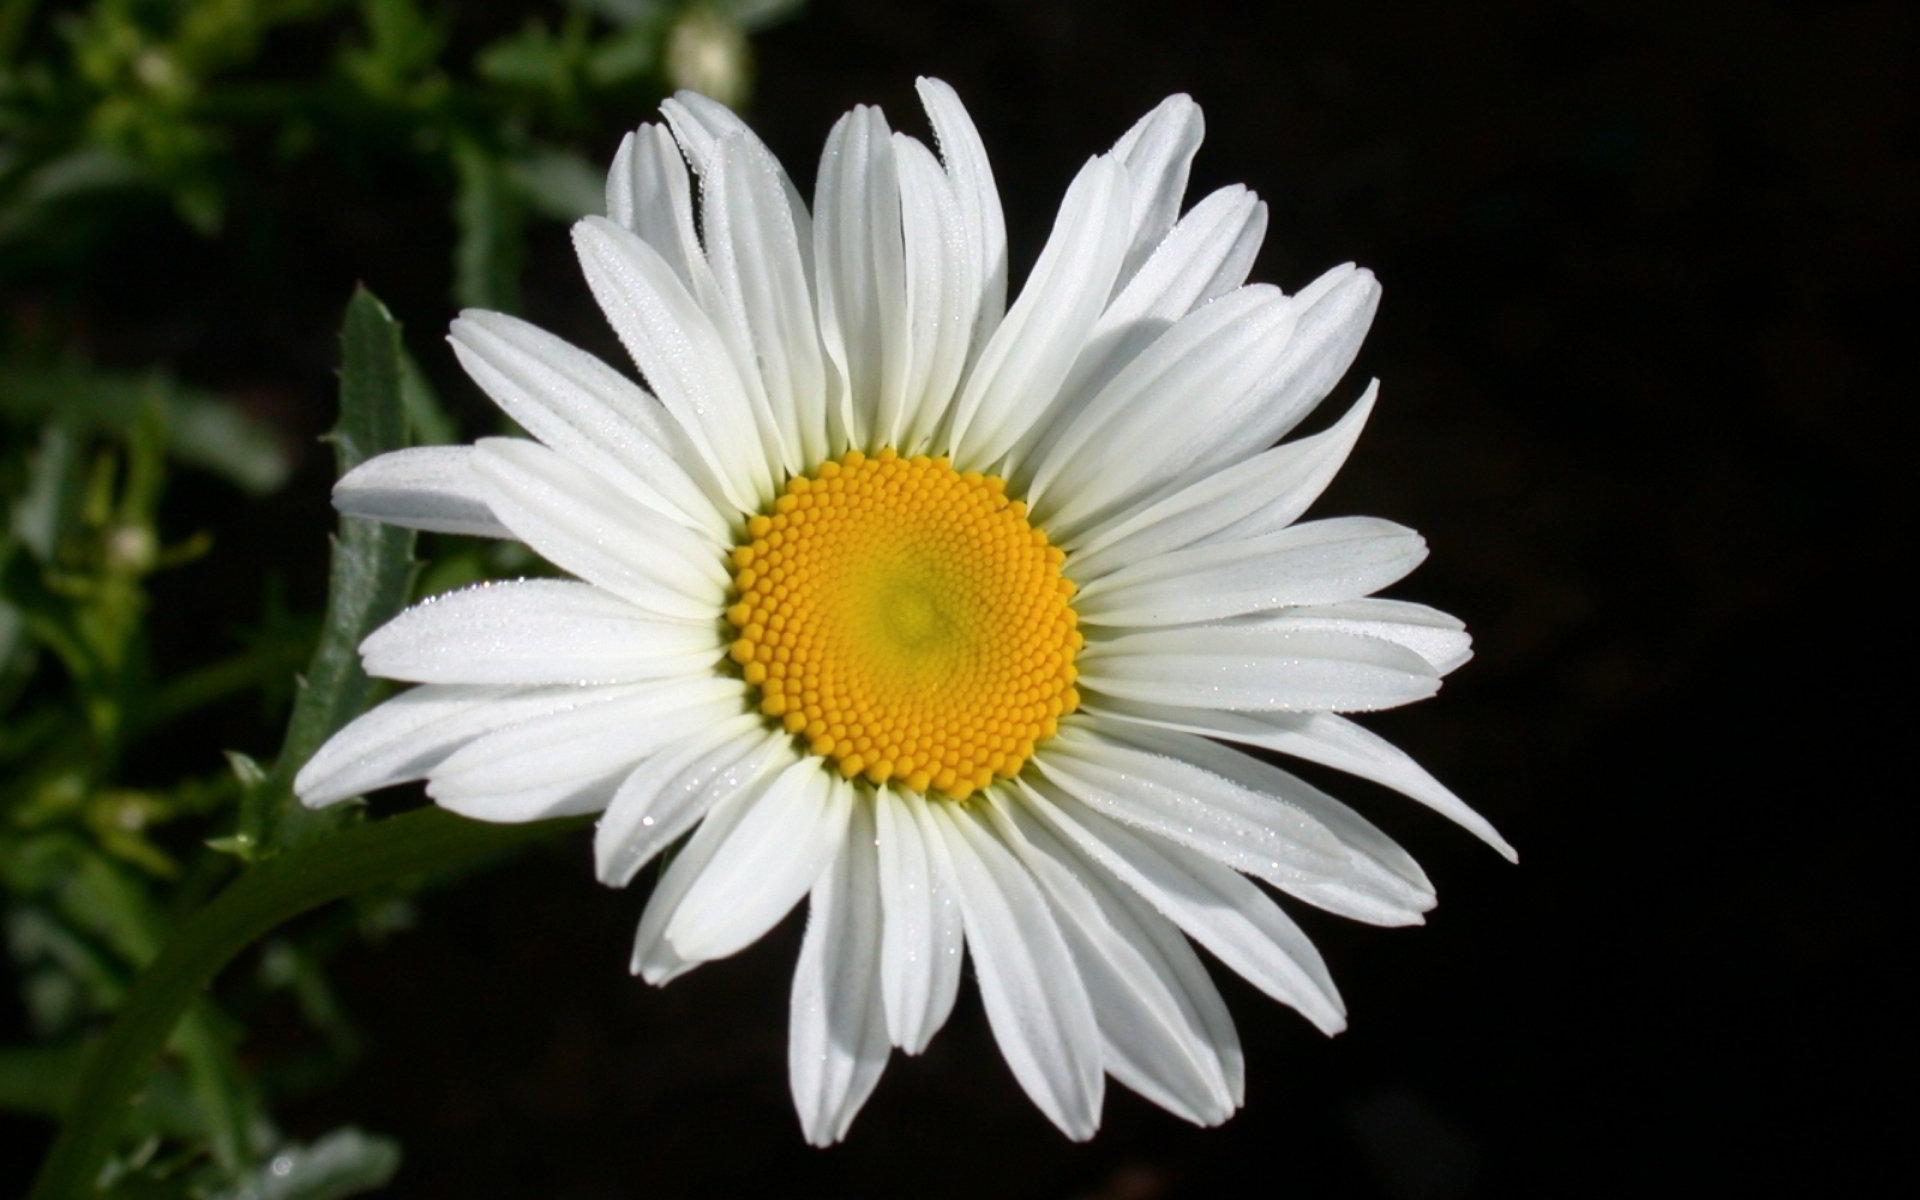 hinh anh hoa cuc dep 67